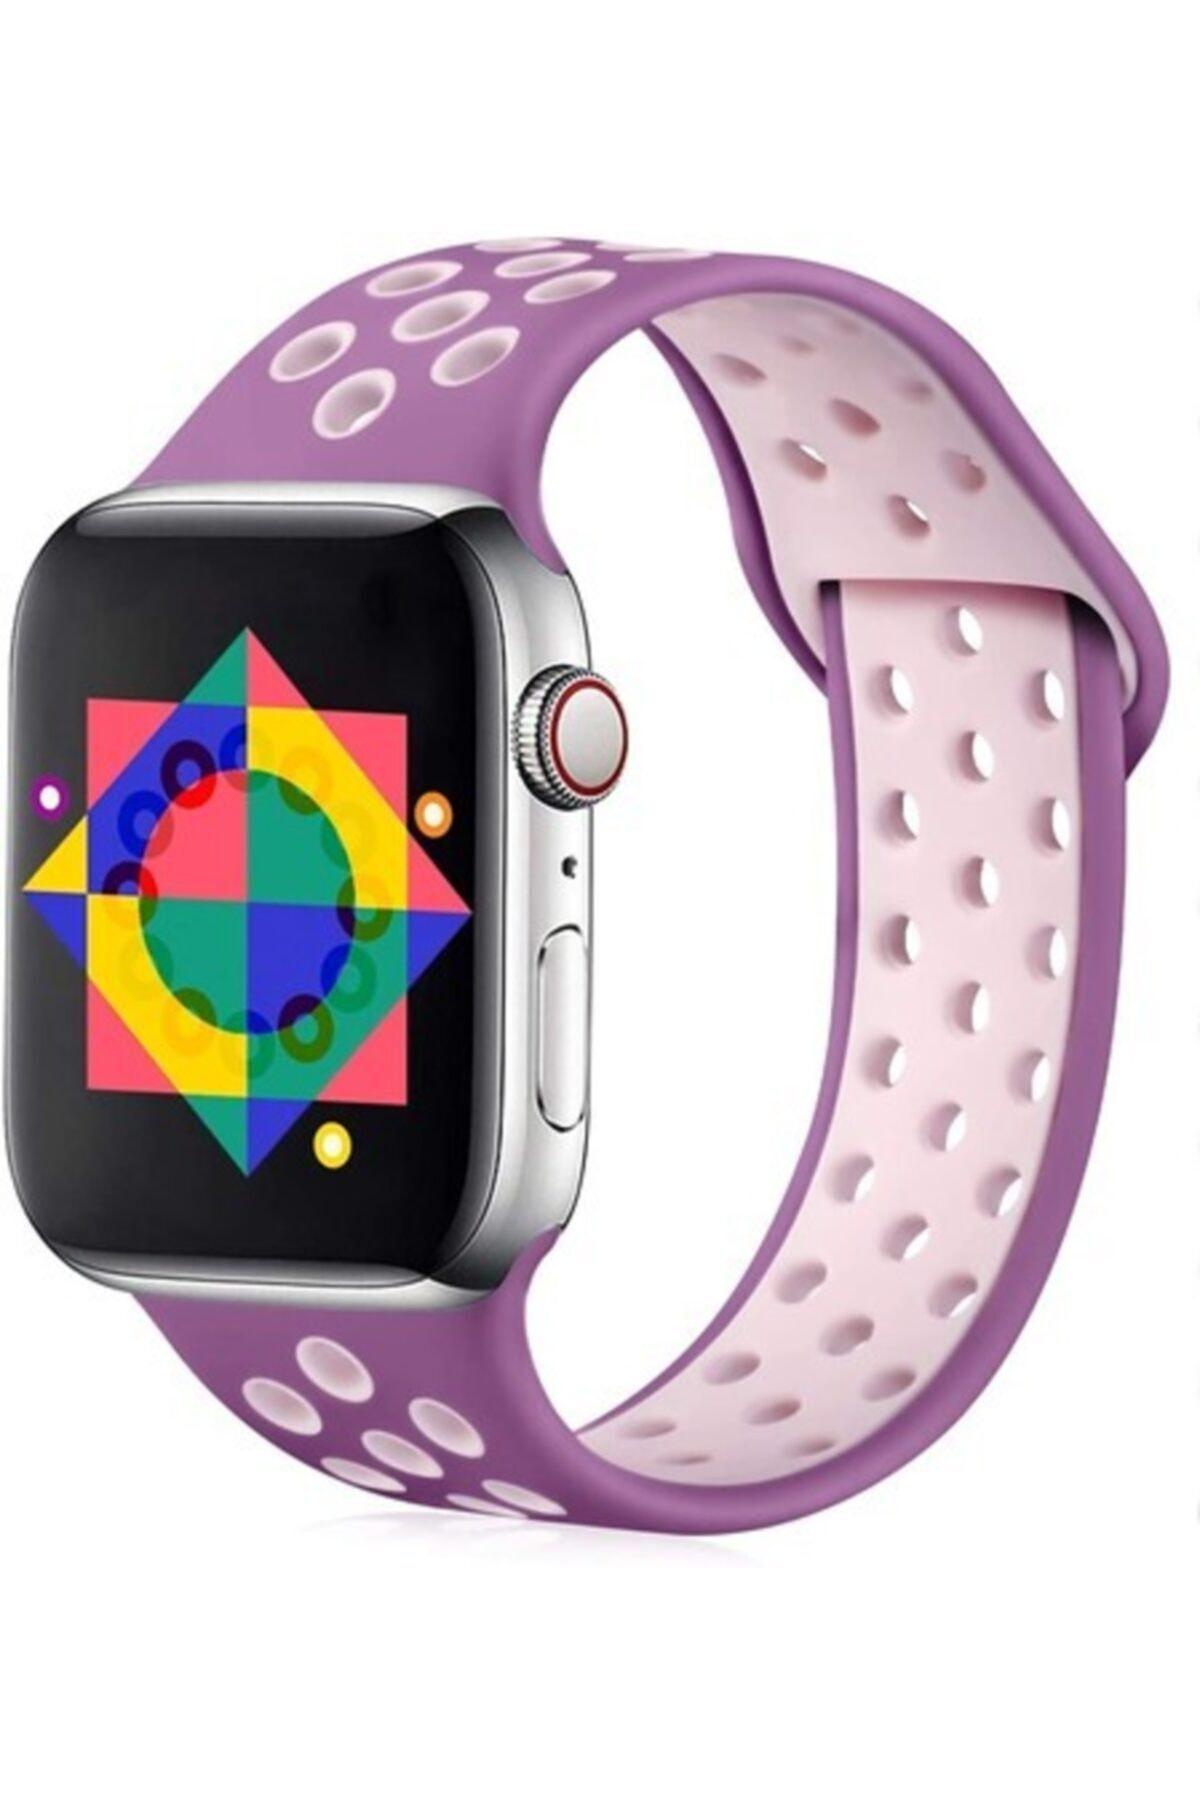 Apple Watch Kordon 2 3 4 5 Seri 38 Mm Ve 40 Mm Delikli Spor Silikon Kordon Kayış Mor Pembe